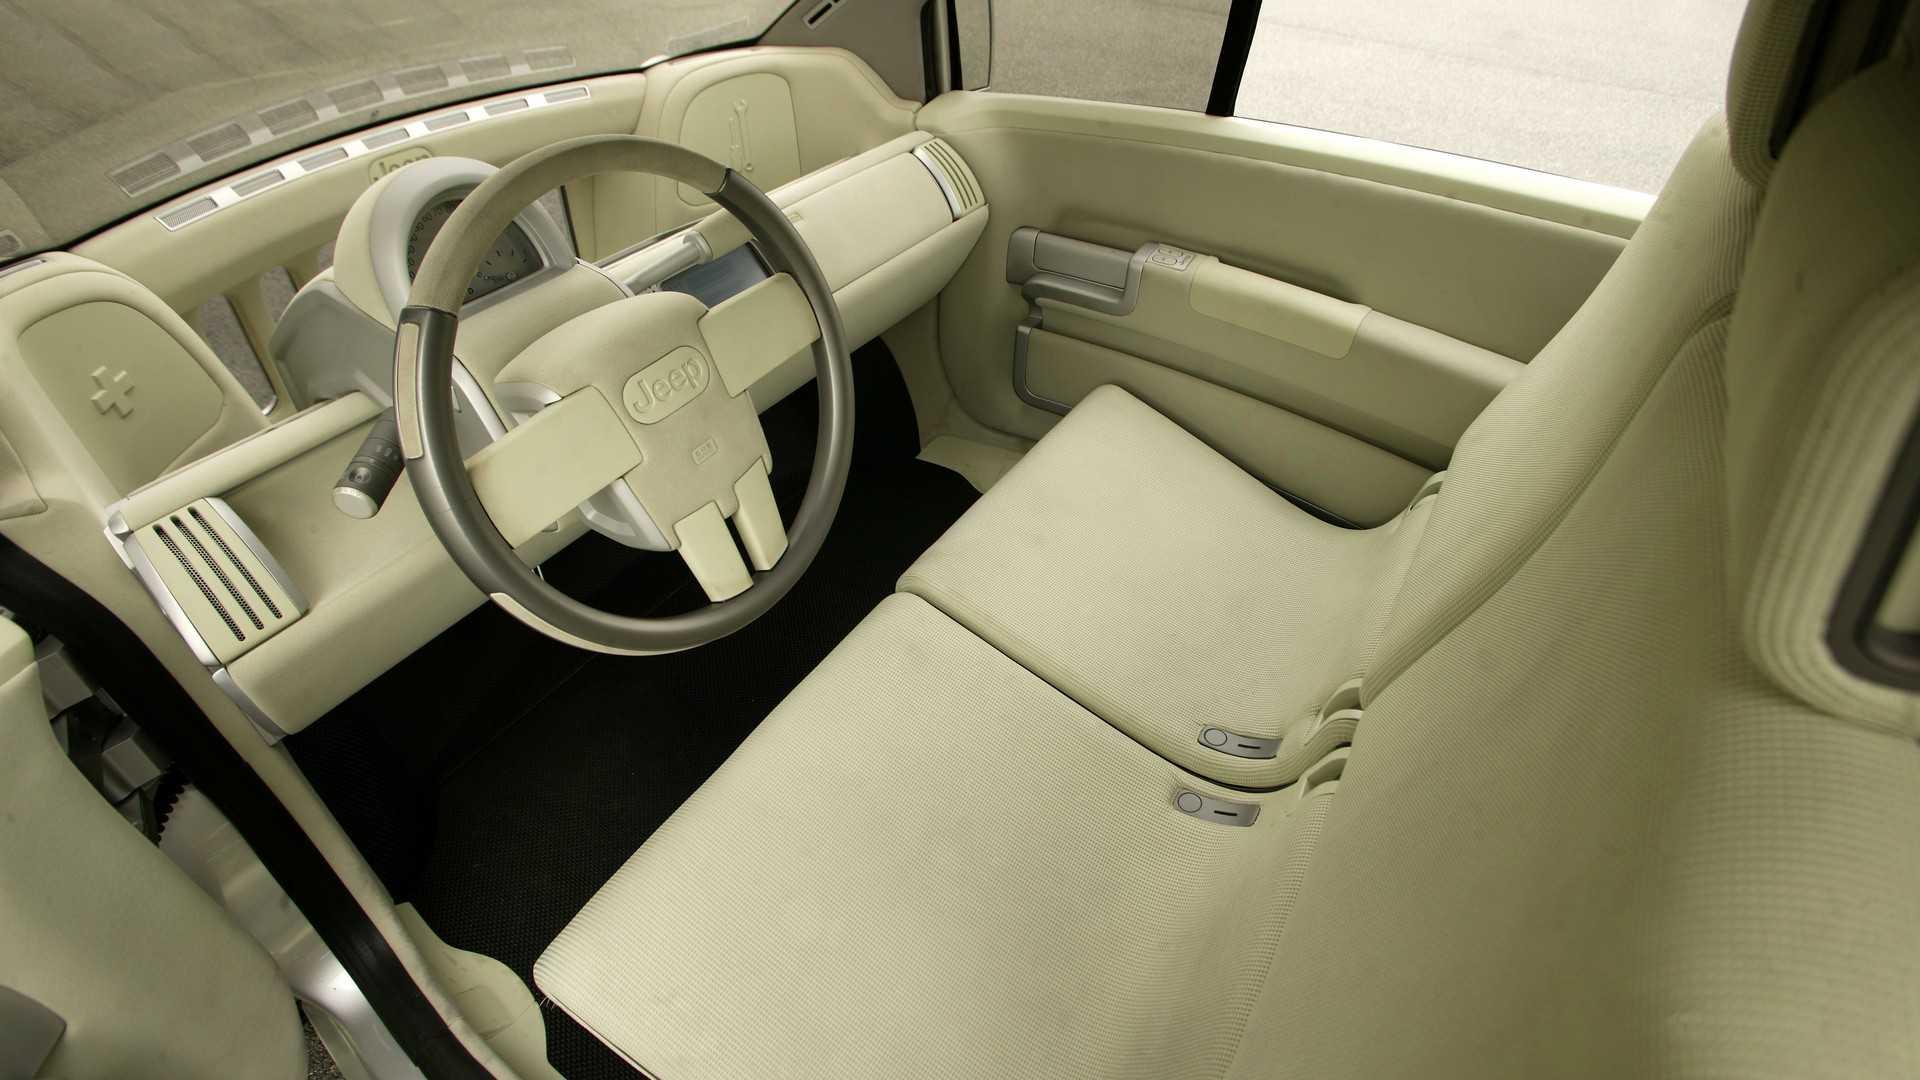 Jeep Treo concept 2003 (23)